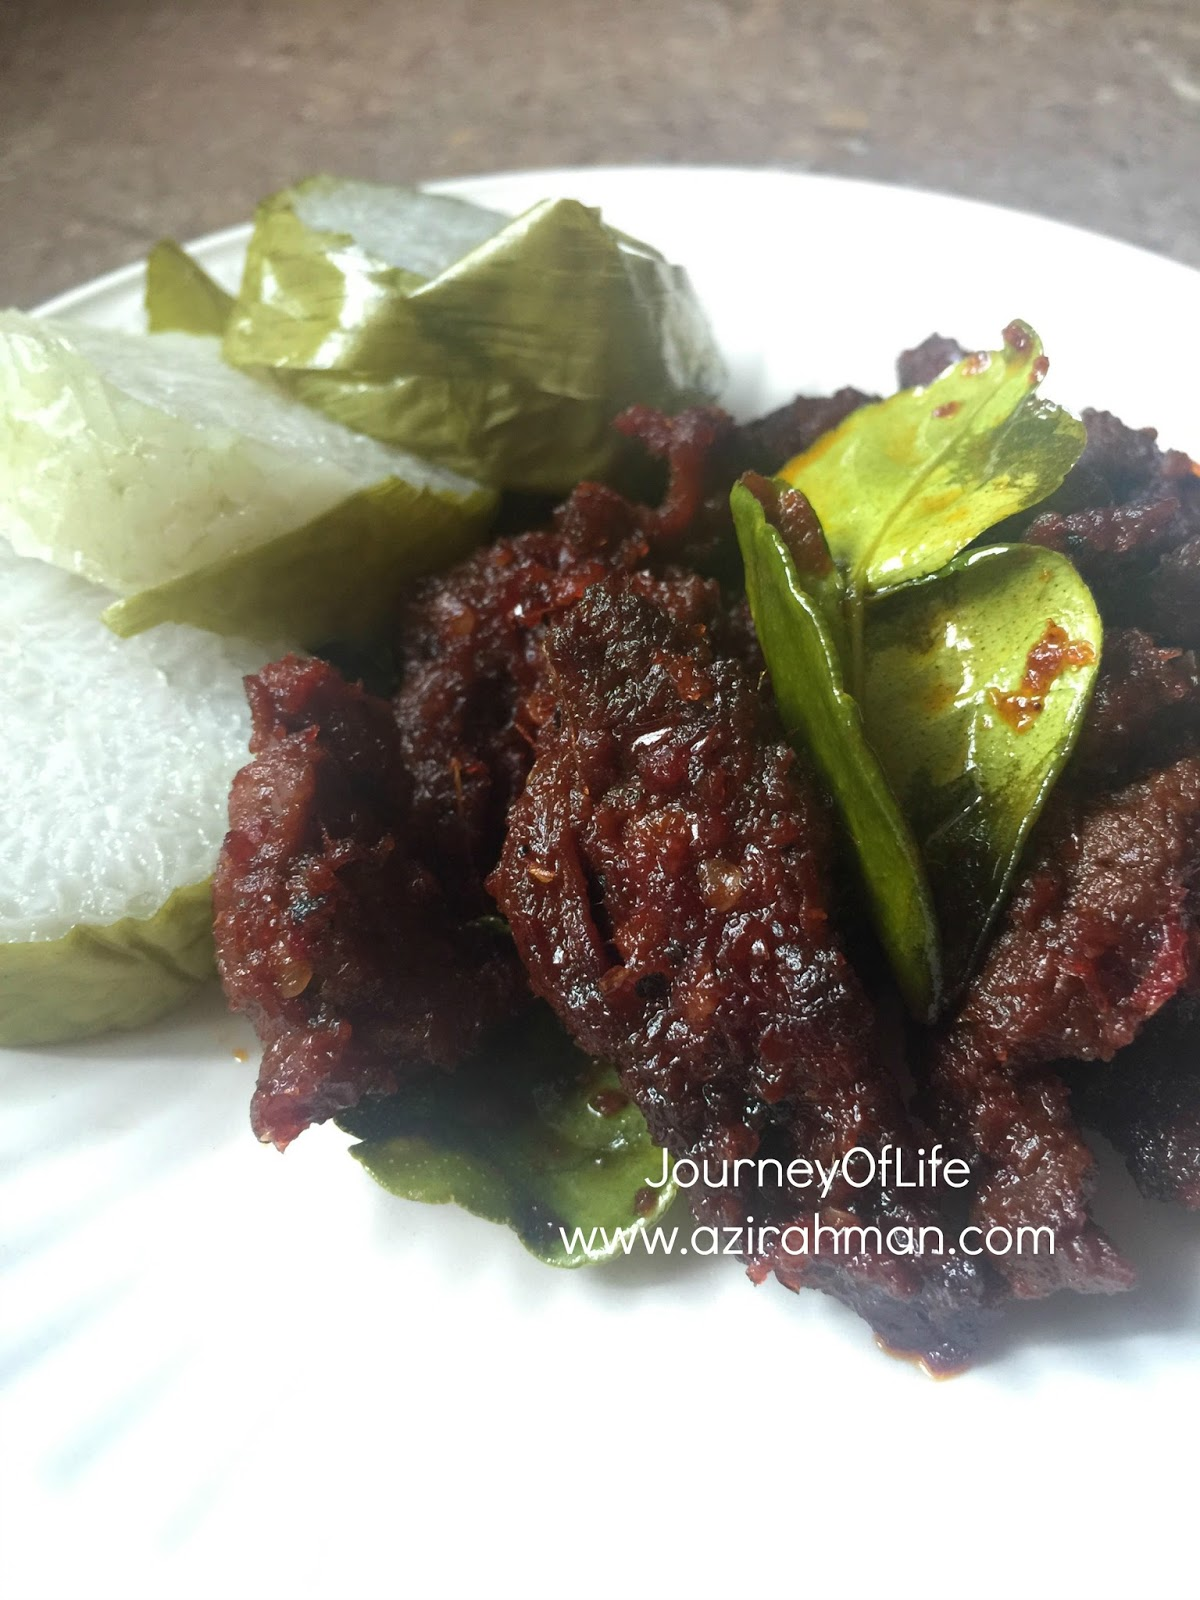 daging dendeng, resepi mudah, masak daging, resepi daging